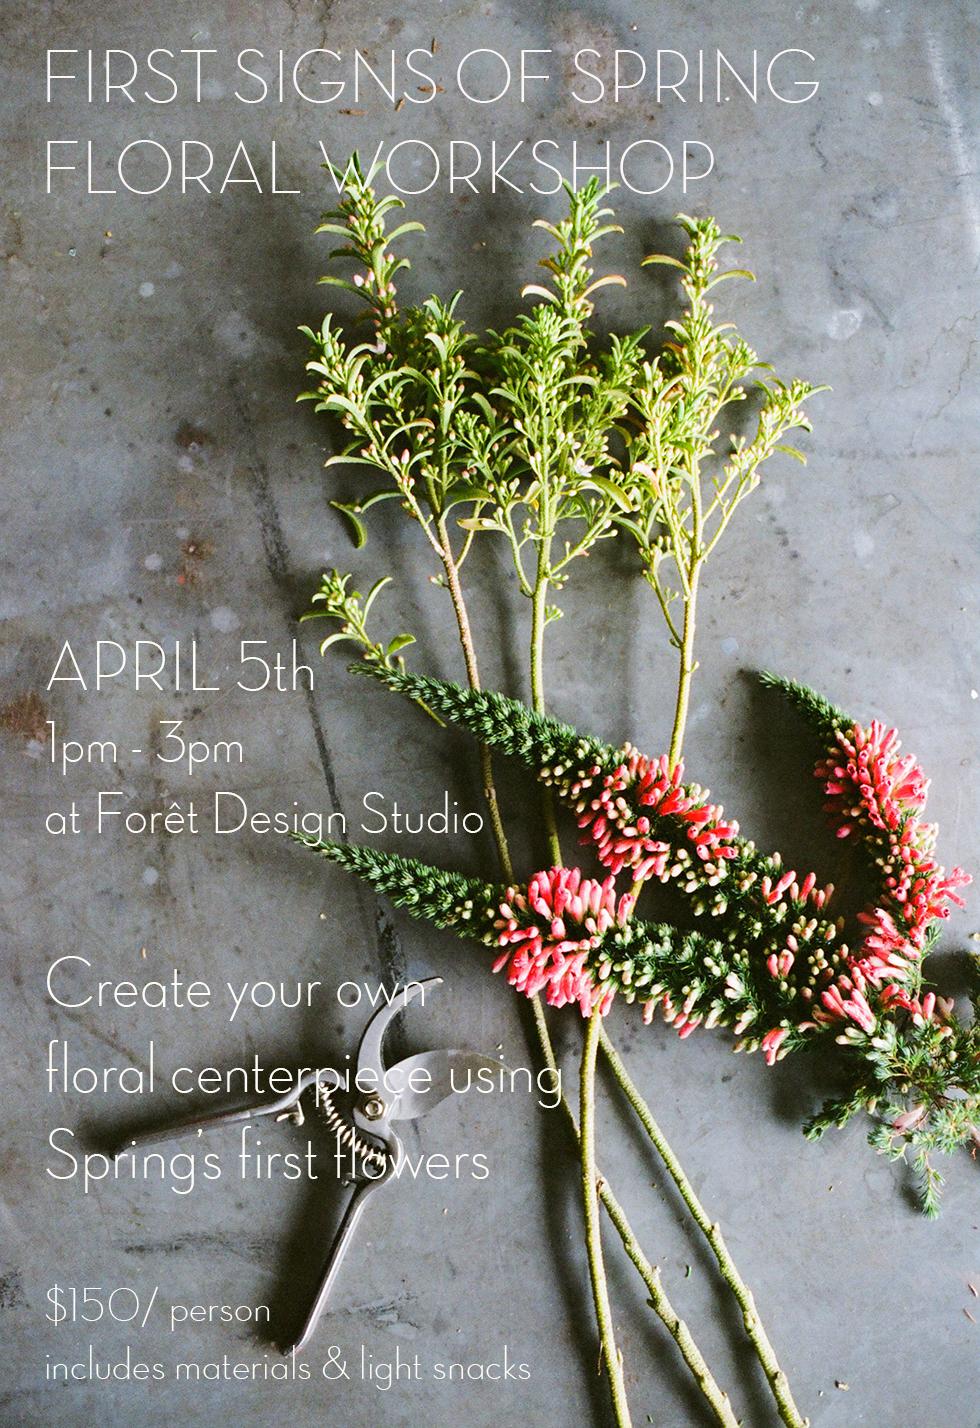 Email ladies@foretdesignstudio.com to signup!    photo by  white loft studio